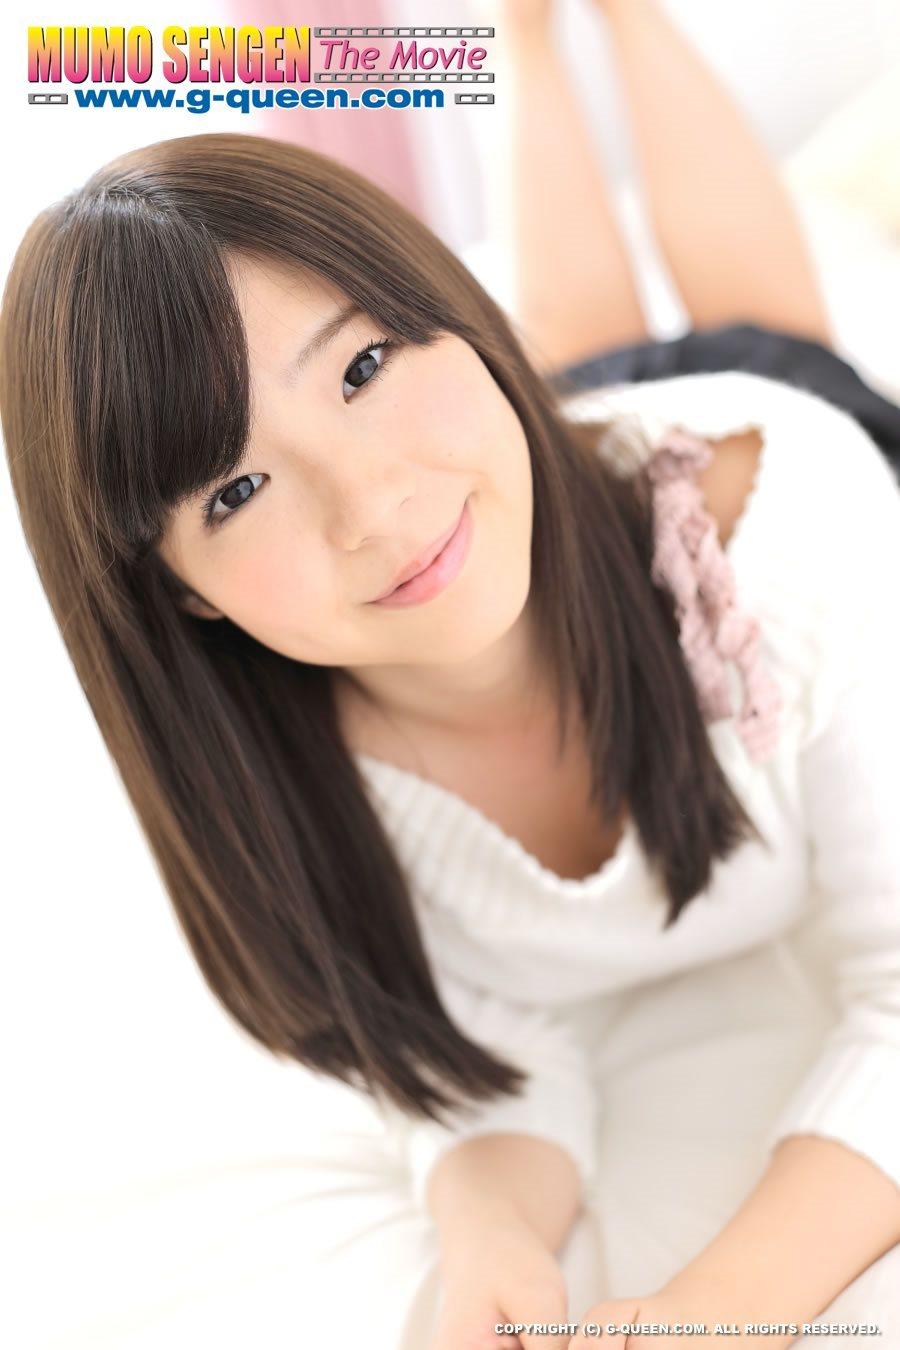 Miho Nomura 野村美保 G-Queen MumoSengen パイパン無毛宣言 ...: www.jjgirls.com/g-queen/miho-nomura/321